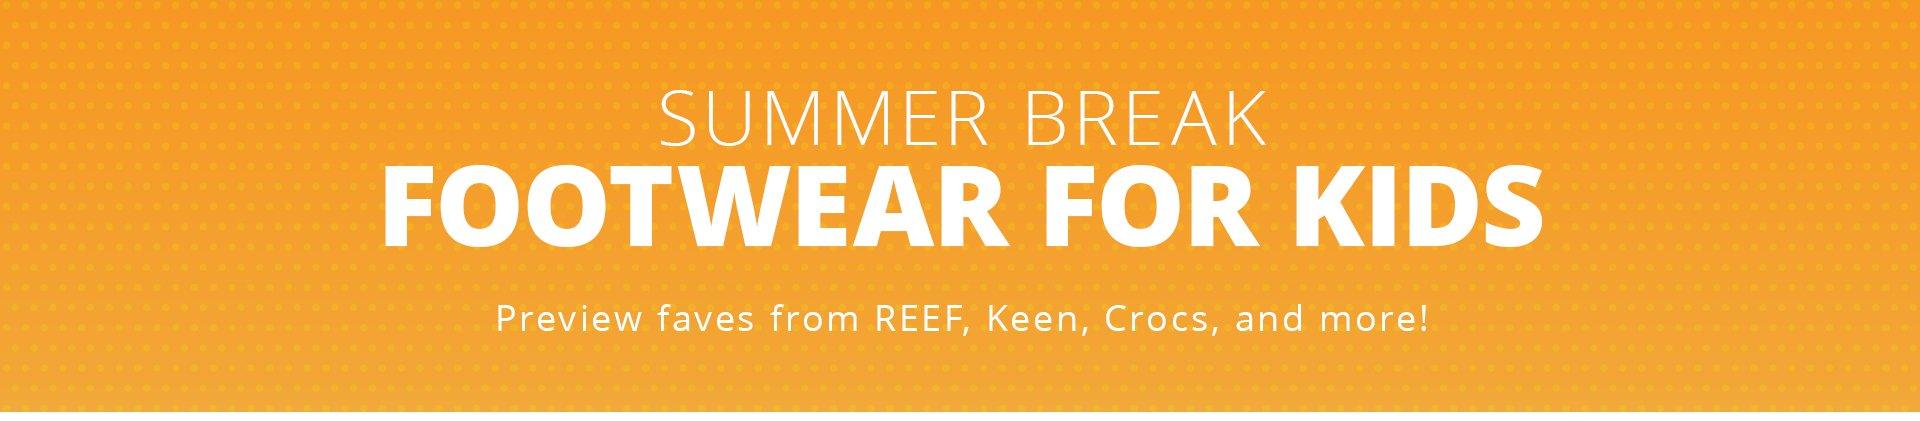 Header-Kids Summer Break